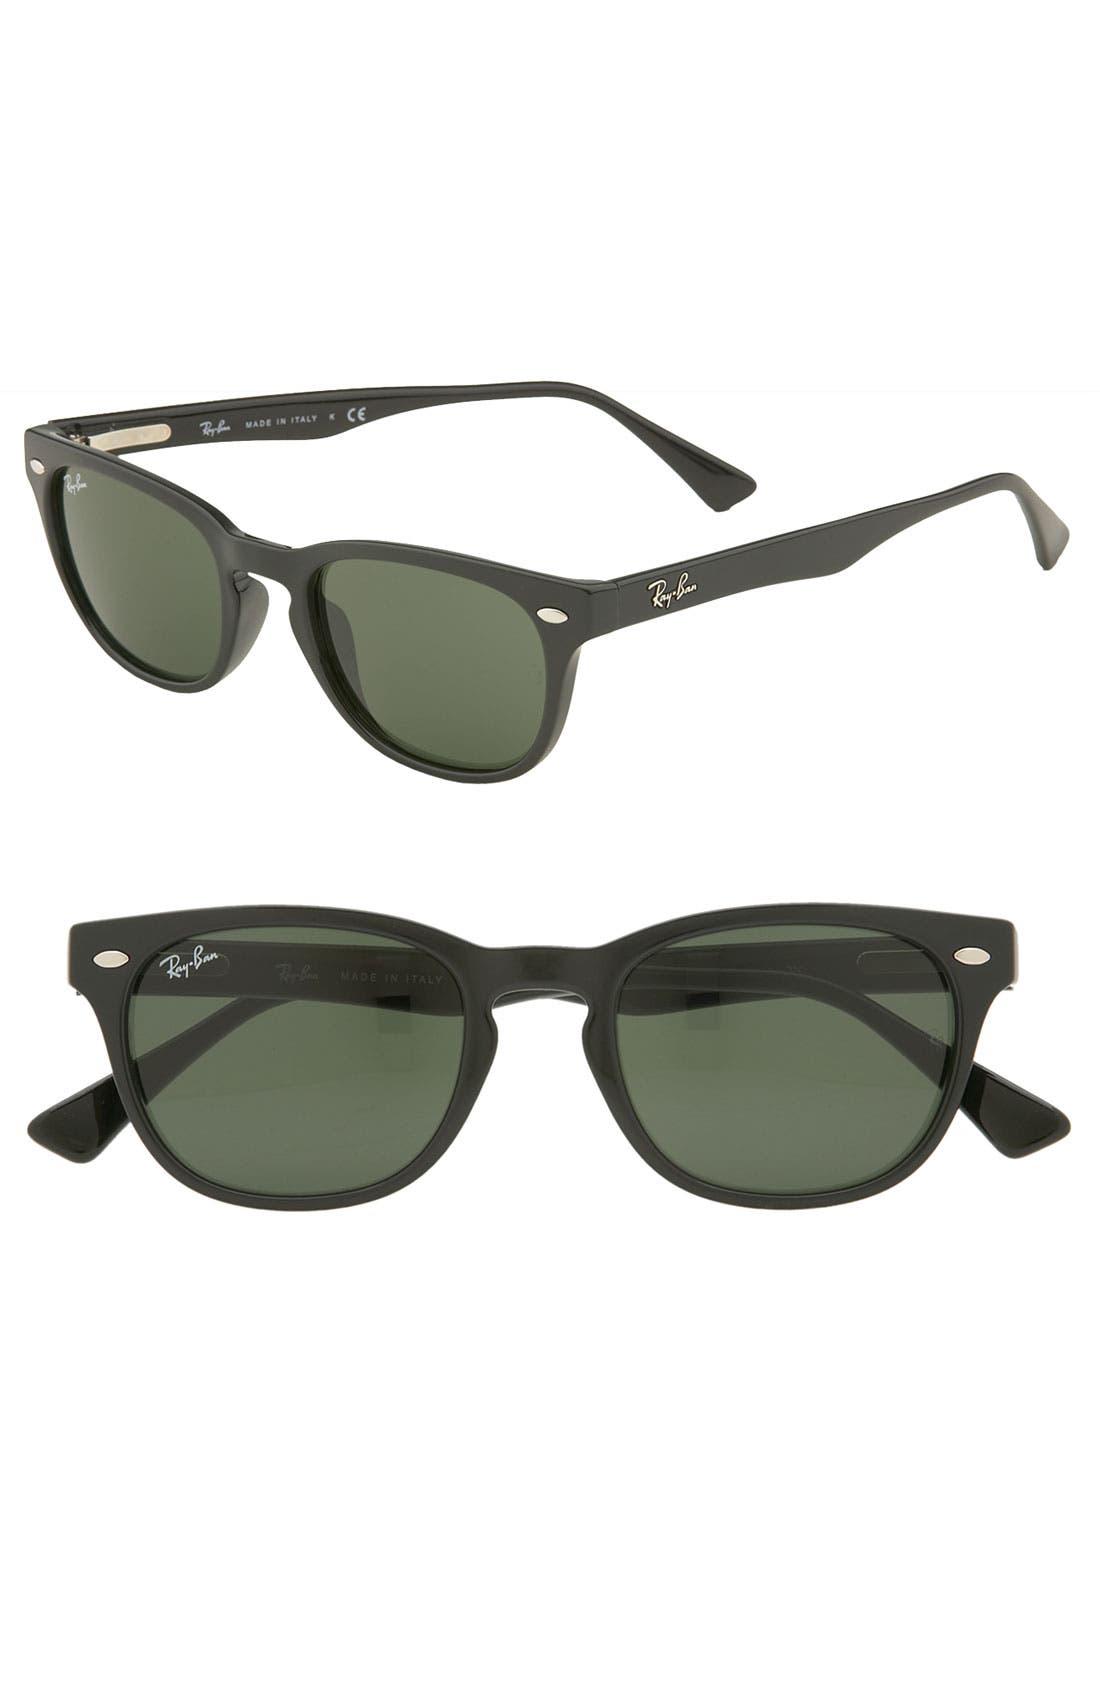 Main Image - Ray-Ban Retro Wayfarer Sunglasses